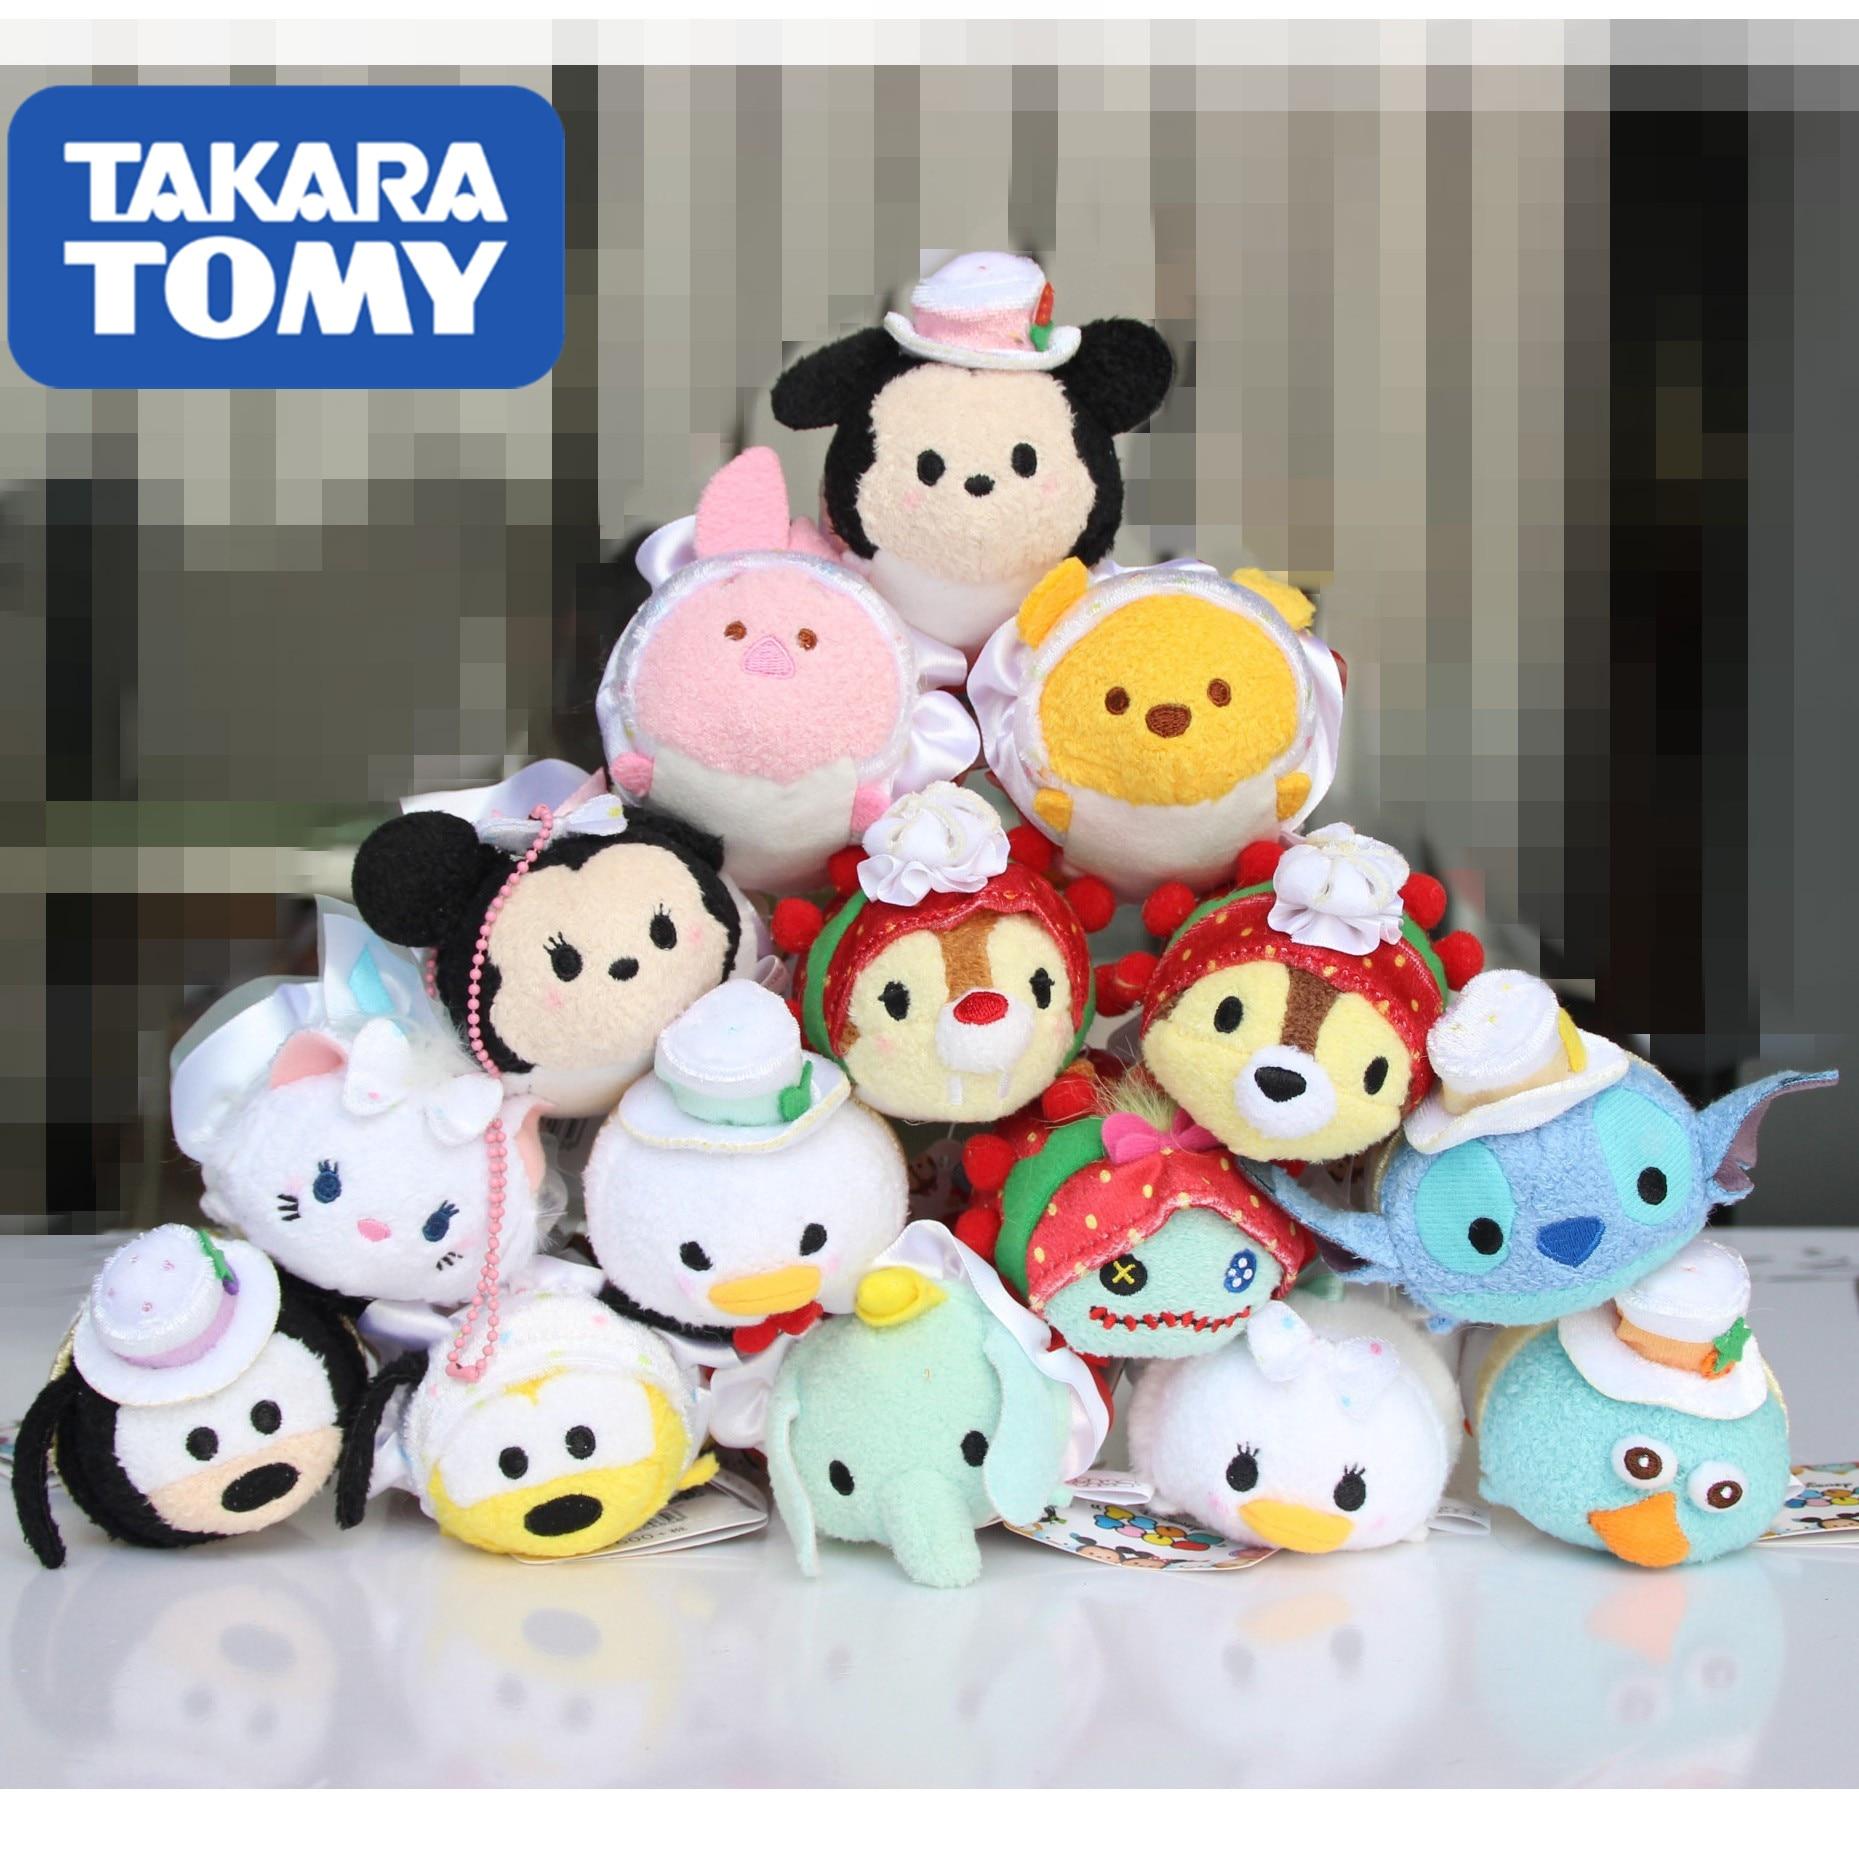 TAKARA TOMY Super TSUM  Mickey  Birthday Gift, Festival Festival, Plush Dolls/Mobile Hanger Car Dolls  Christmas Present